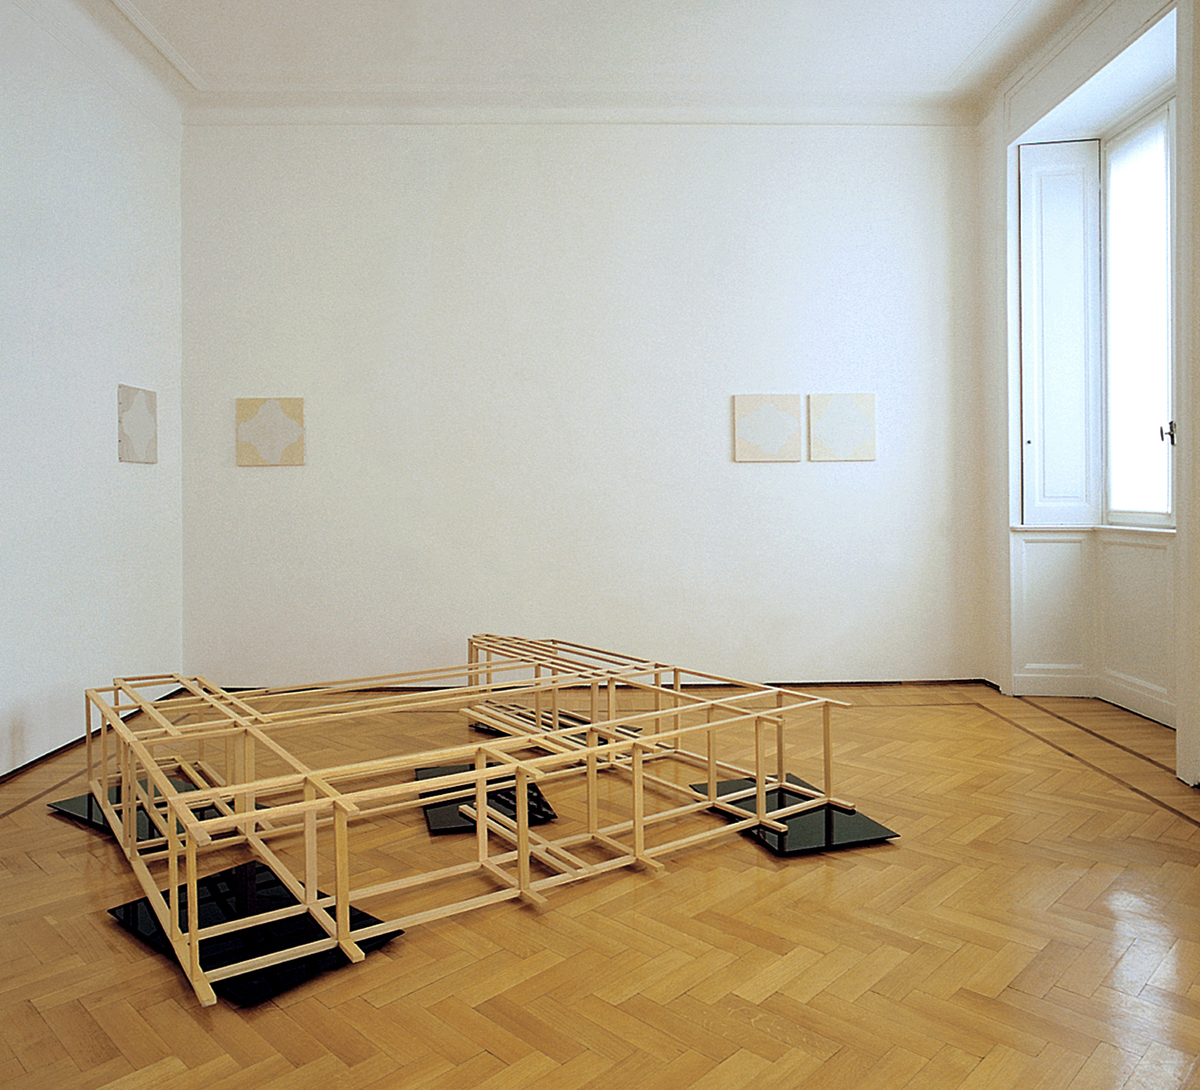 Antonio Catelani - Antonio Catelani Studio Guenzani, Milano 1989